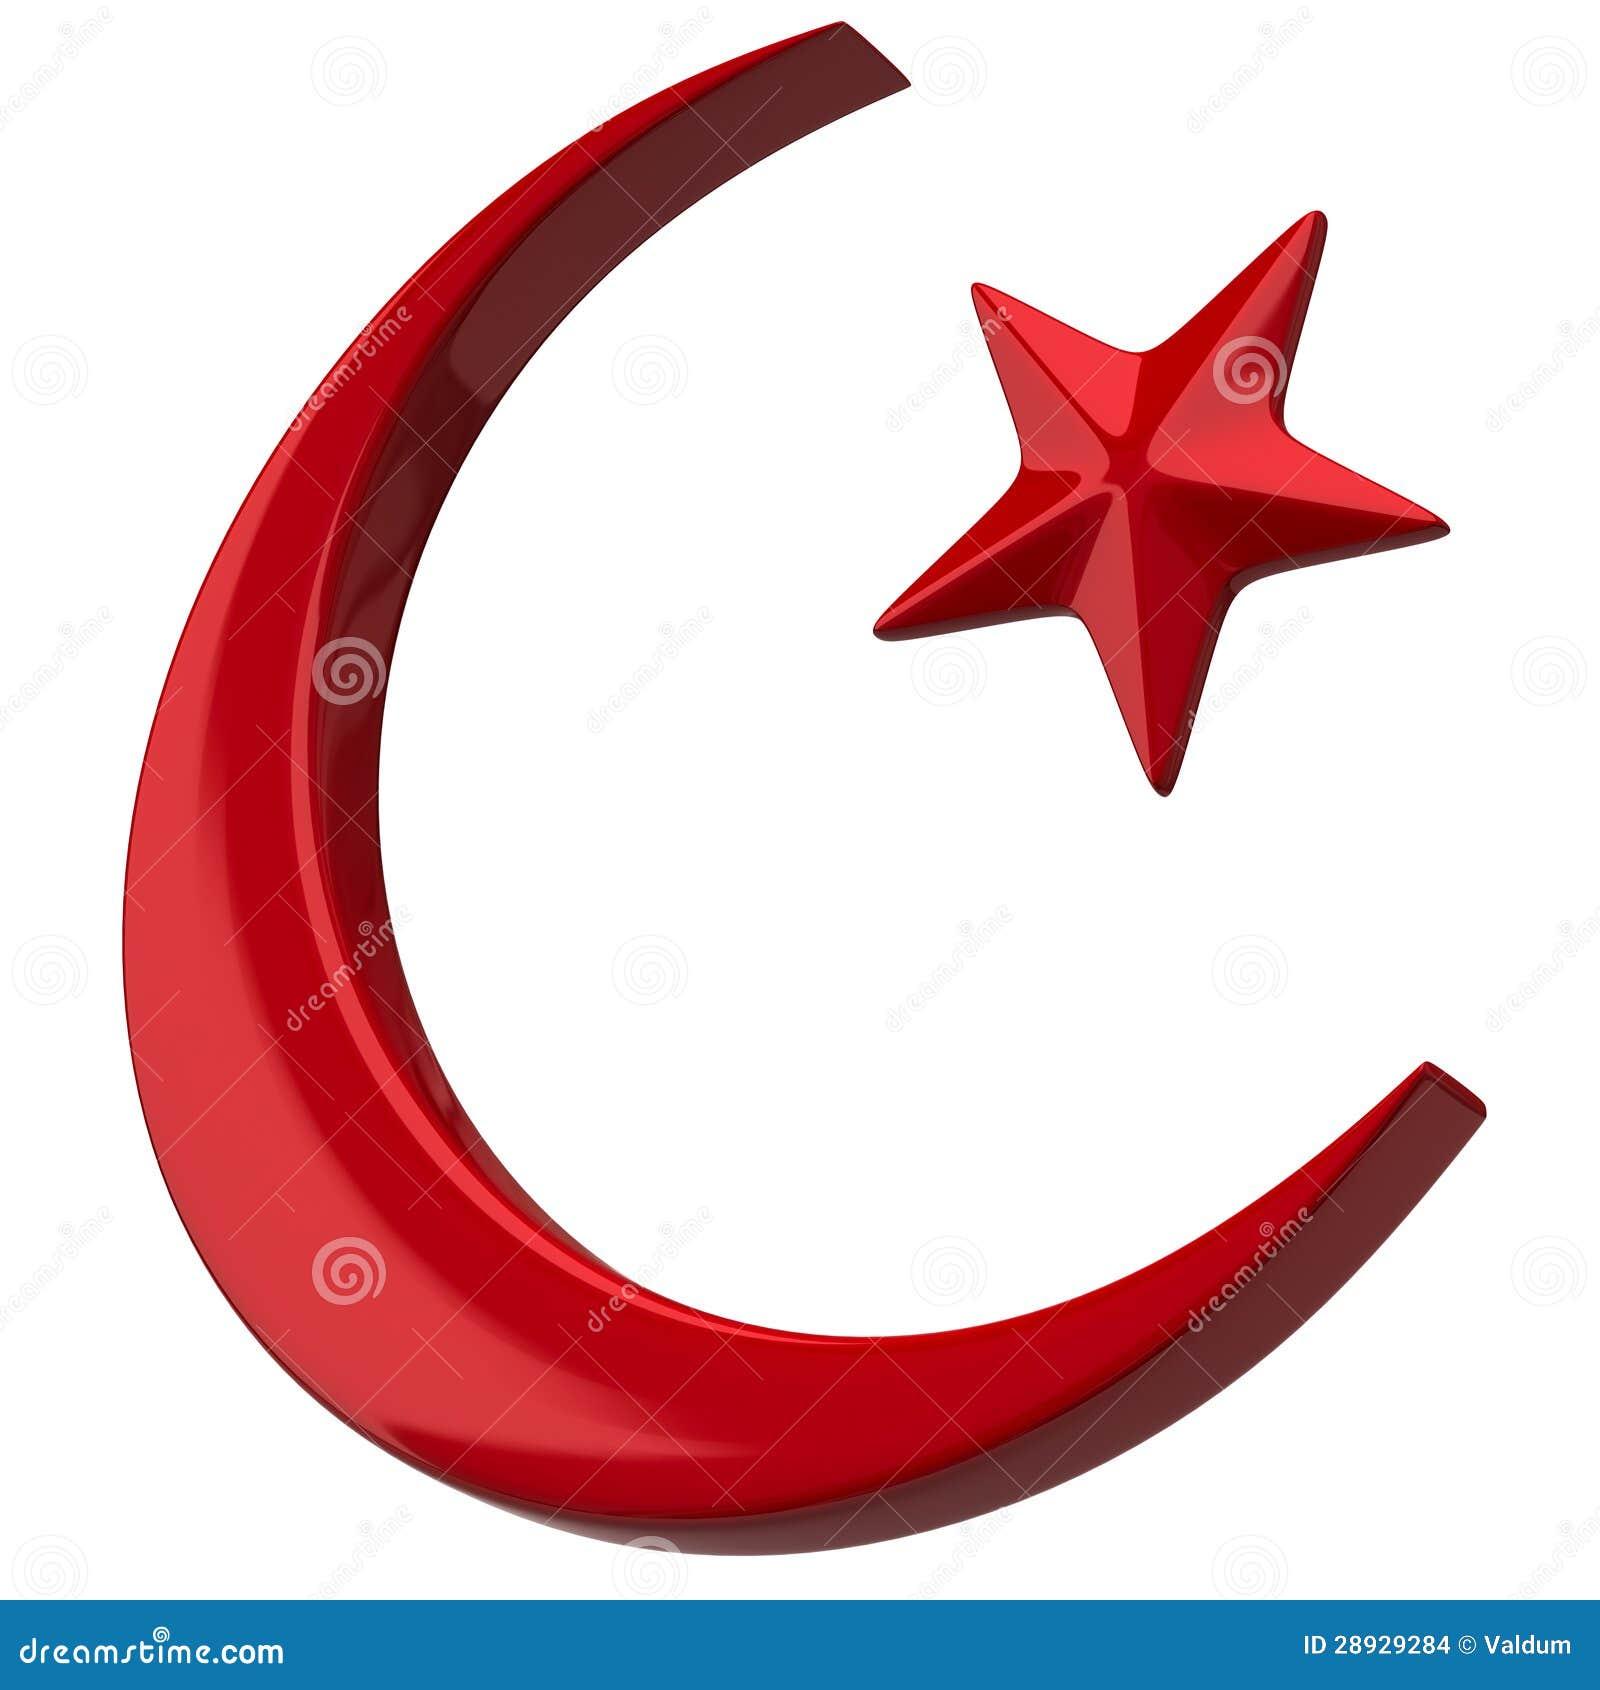 Crescent Islamic Symbol Stock Images - Image: 28929284